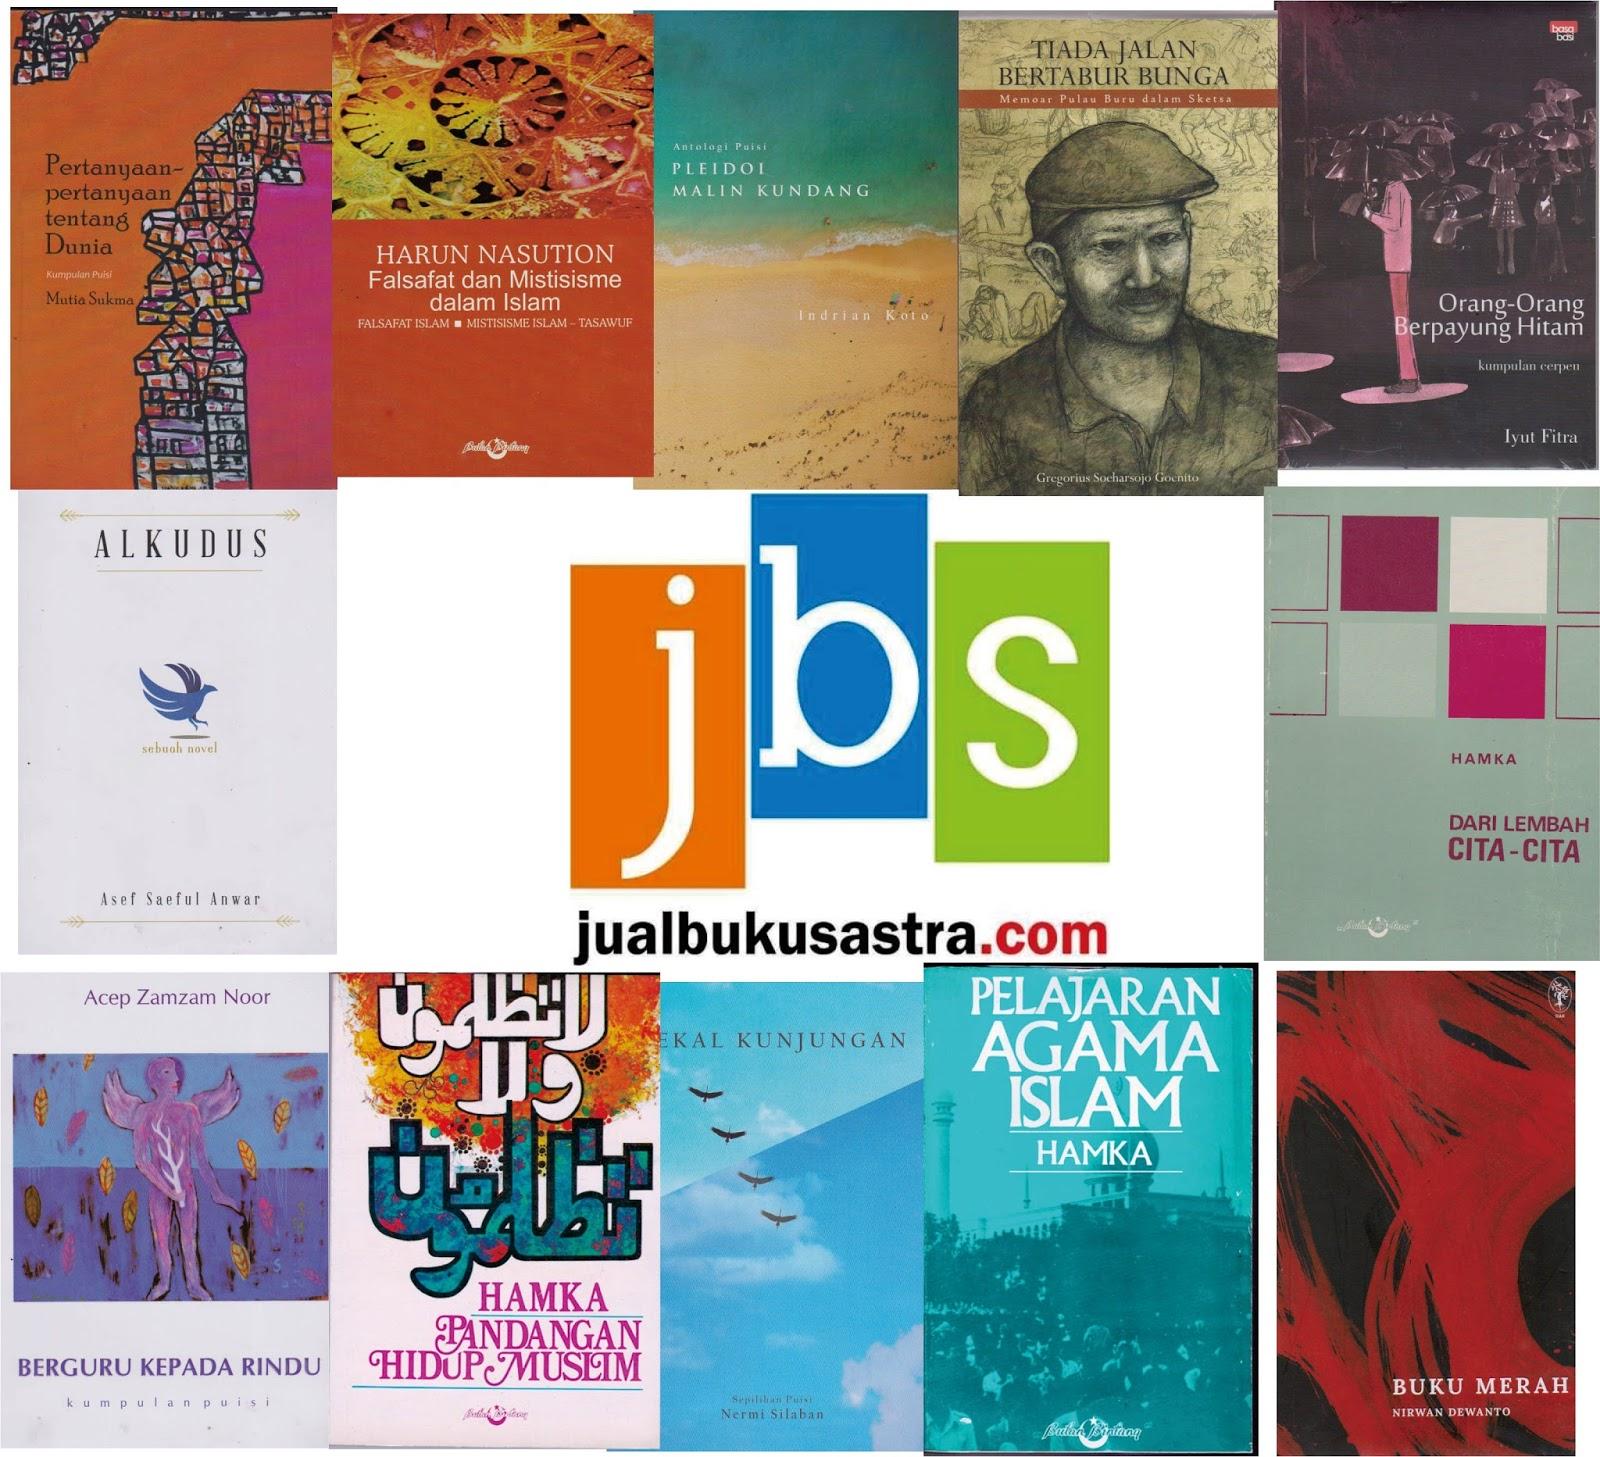 Jualan Buku Sastra Katalog Sastra Nonsastra Mei 2017